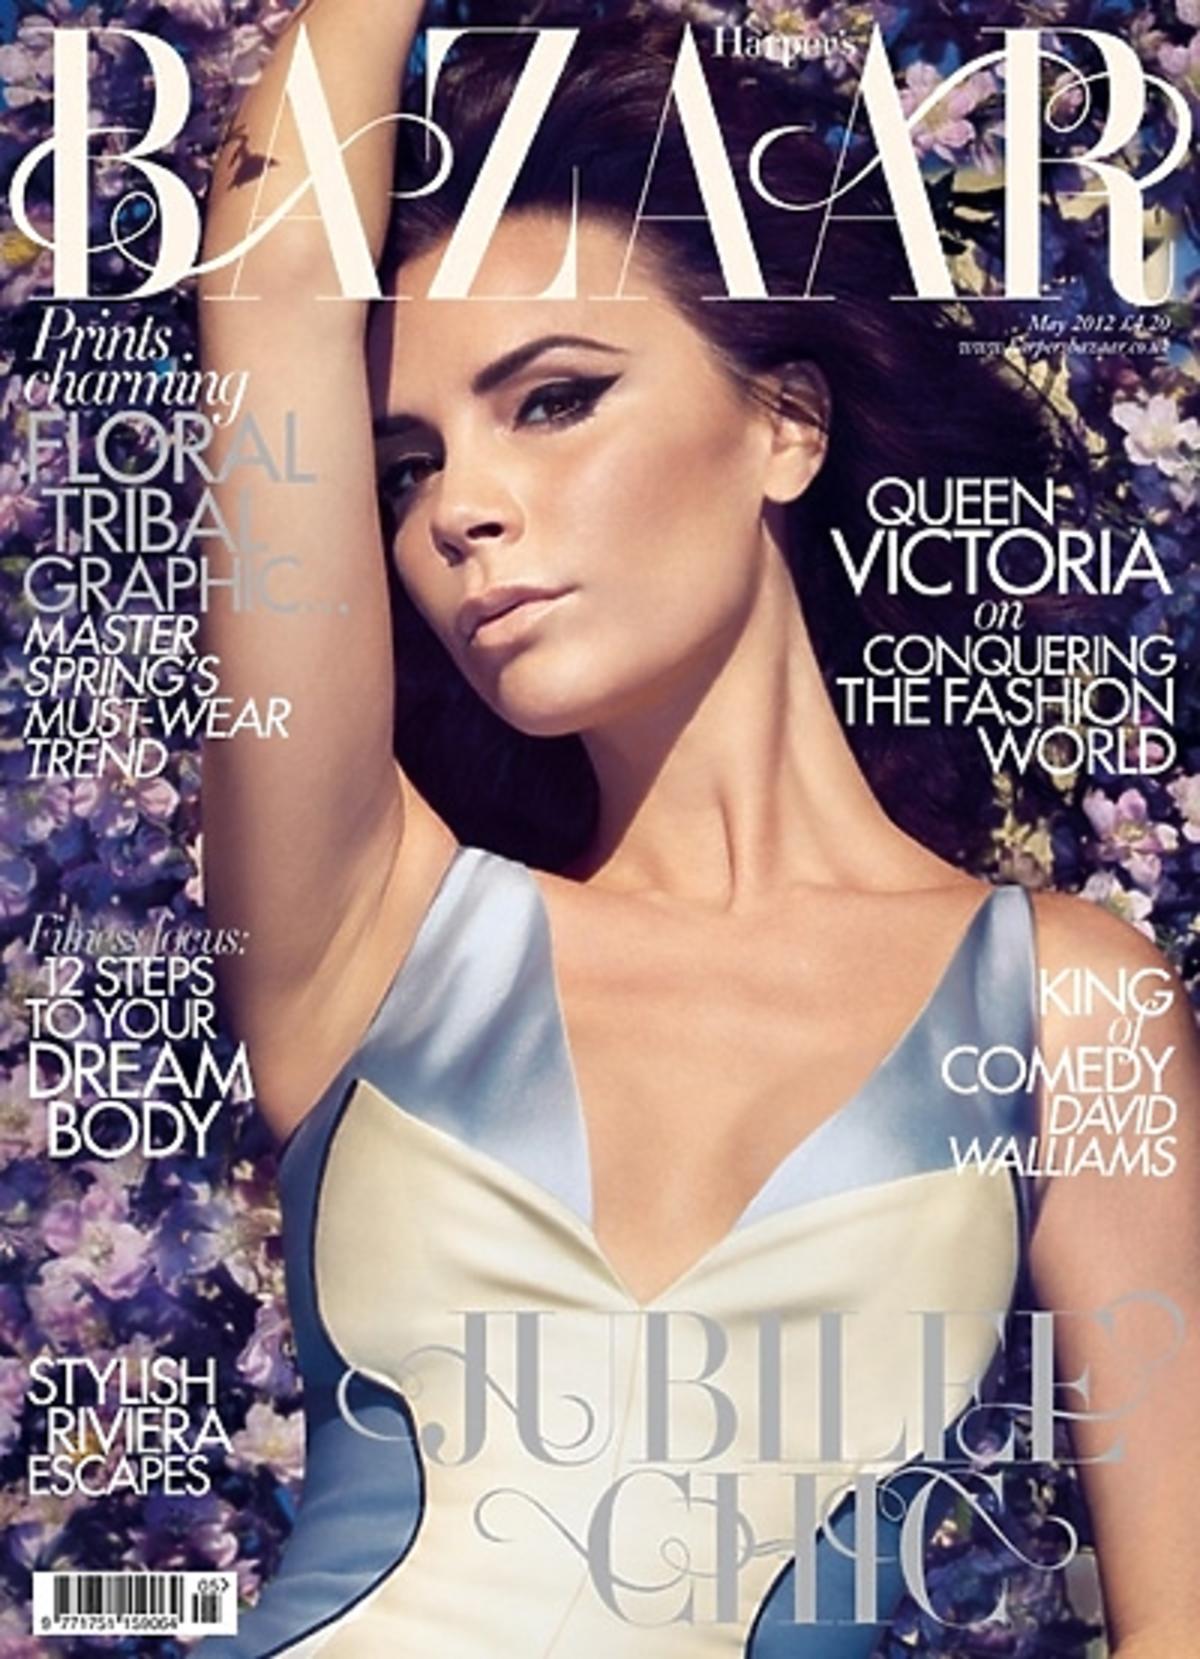 Victoria-Beckham-Harpers-Bazaar-UK-May-2012-01a.jpg